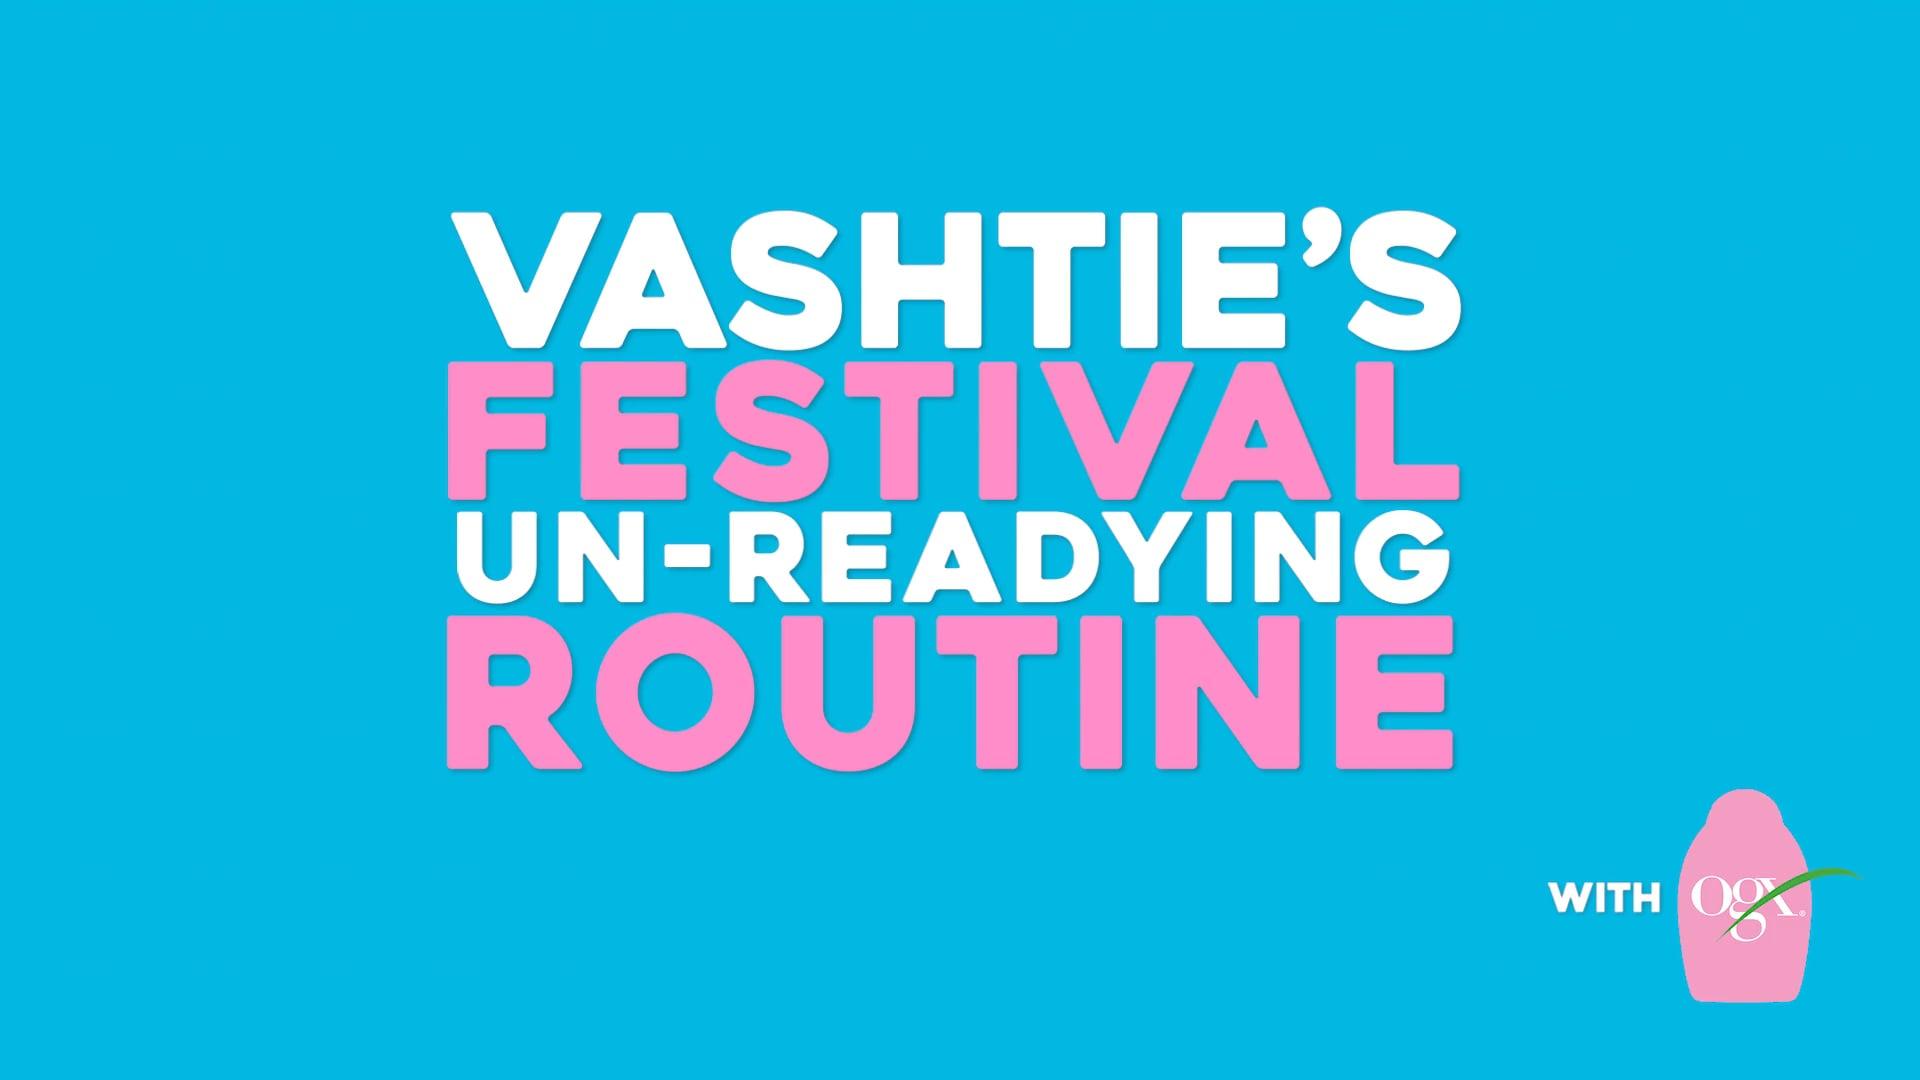 OGX | Vashtie's Unreadying Routine